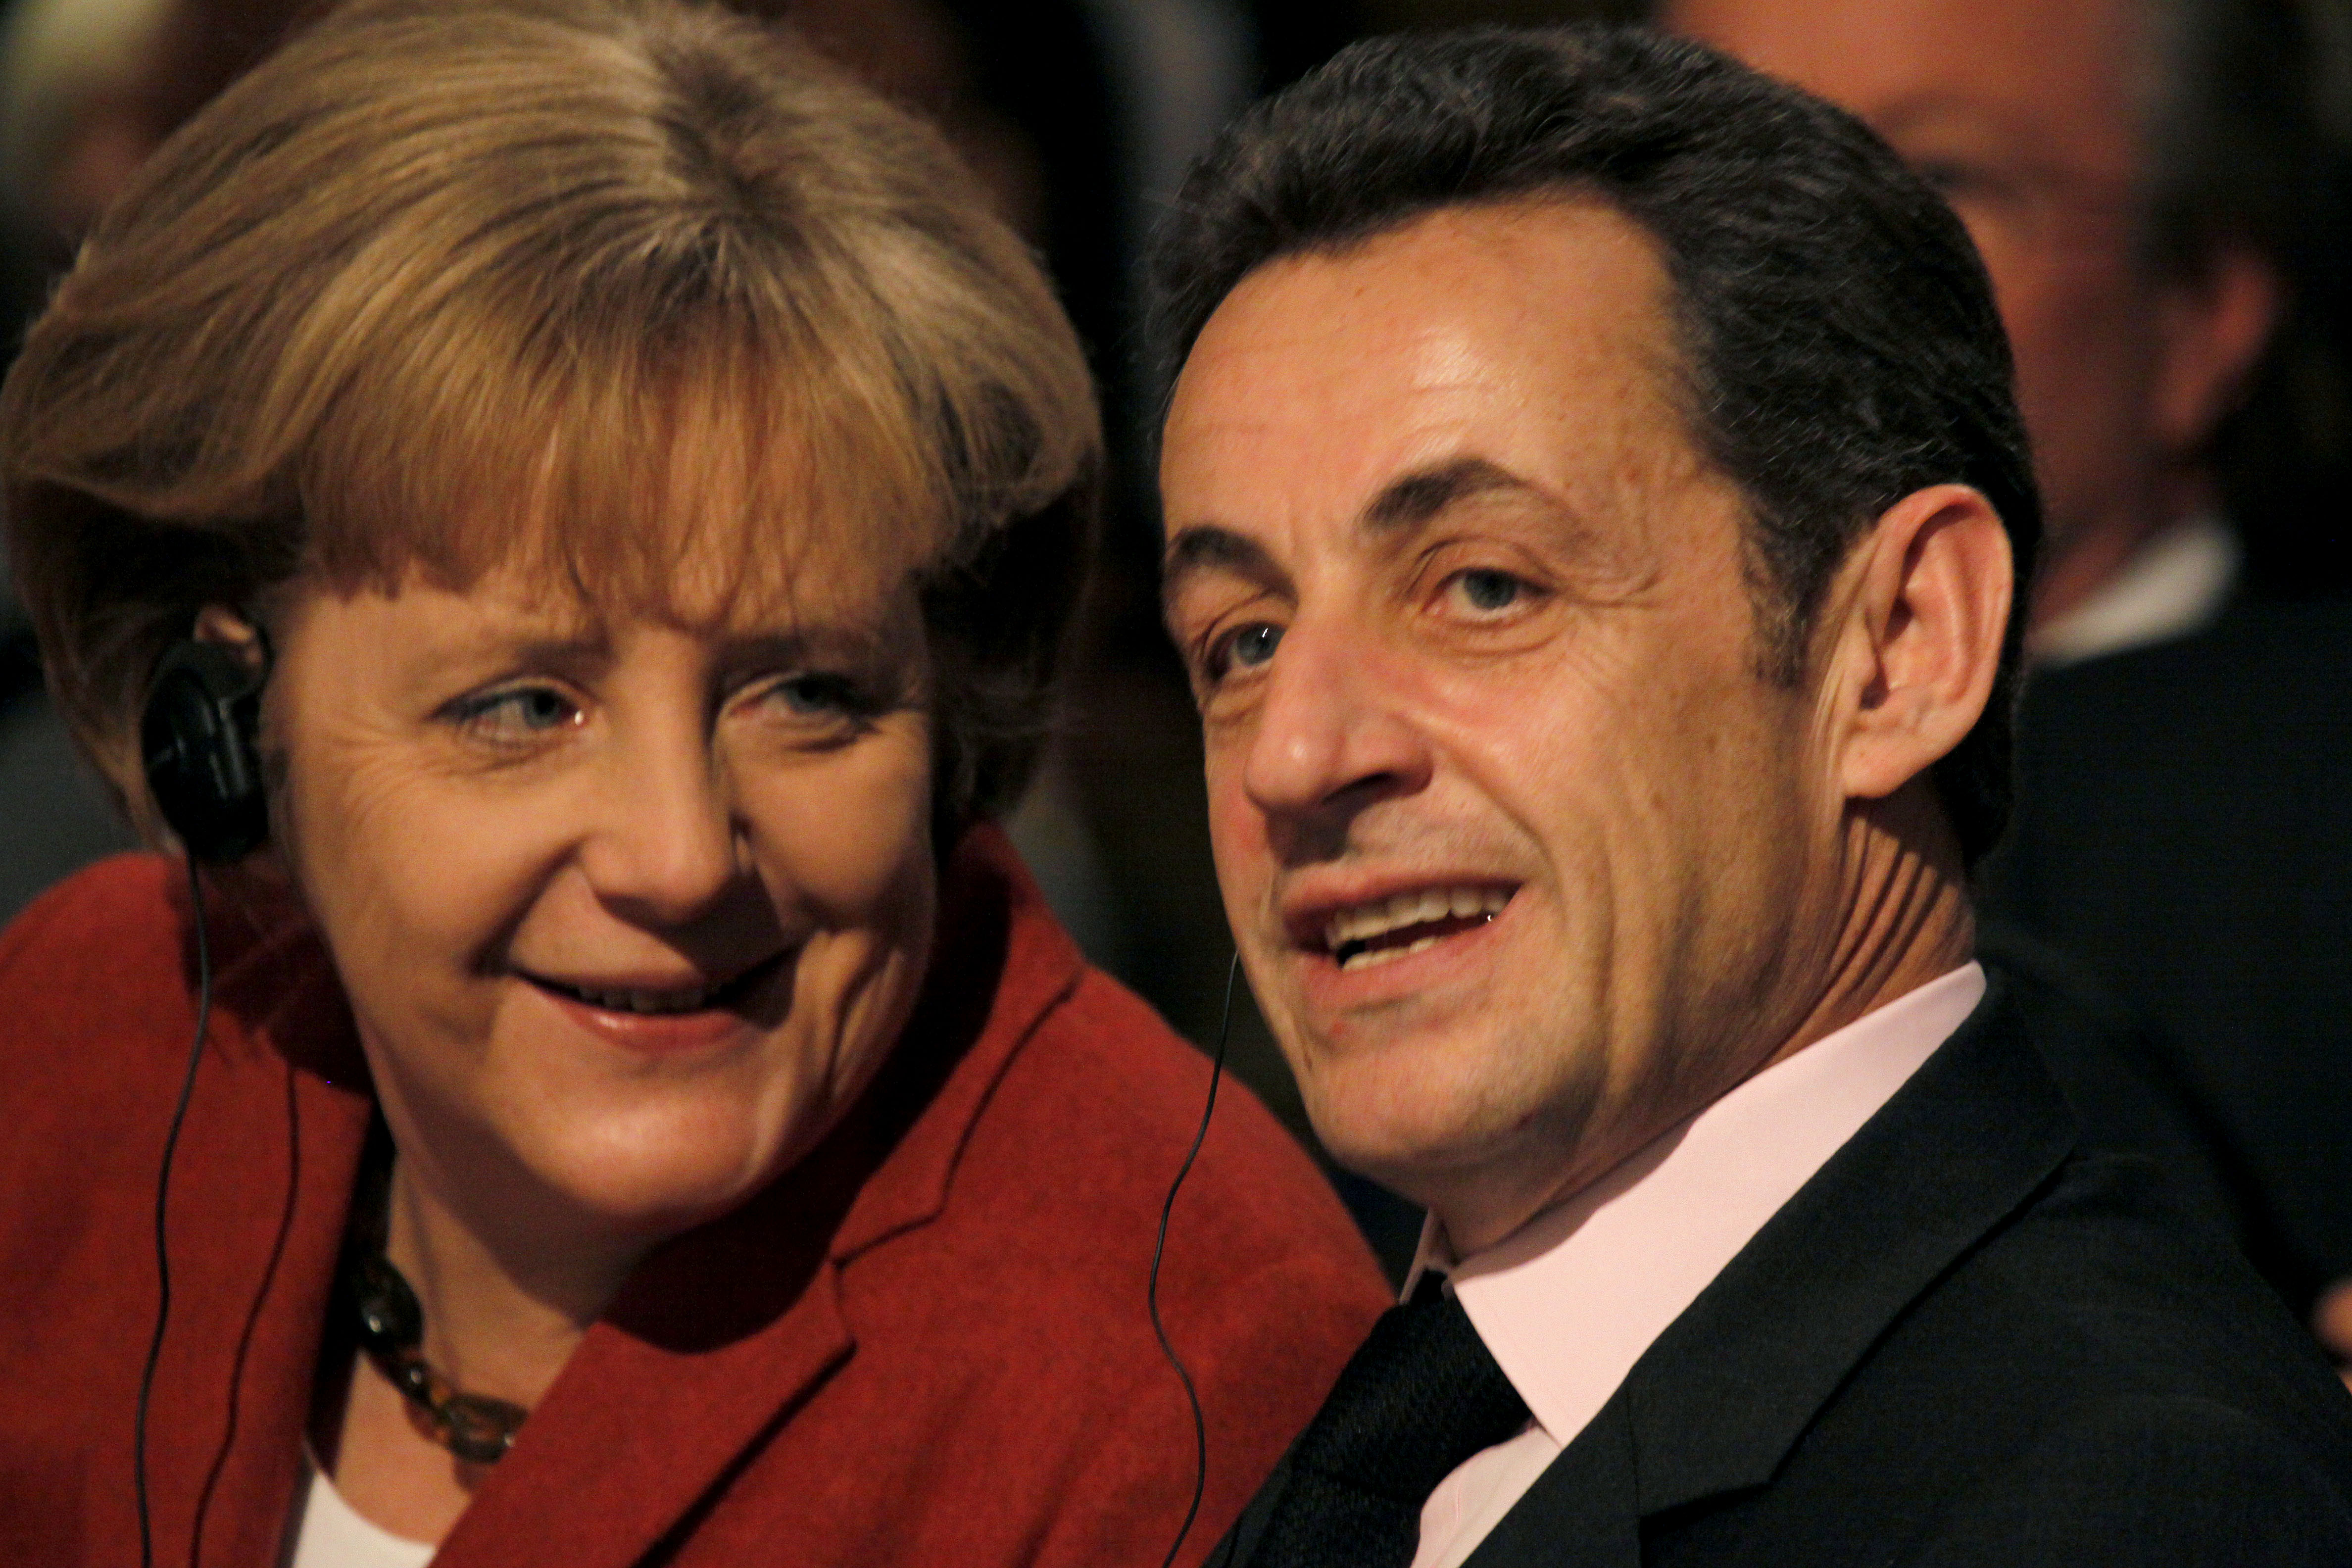 File:Msc 2009-Saturday, 11.00 - 13.00 Uhr-Zwez 002 Merkel Sarkozy